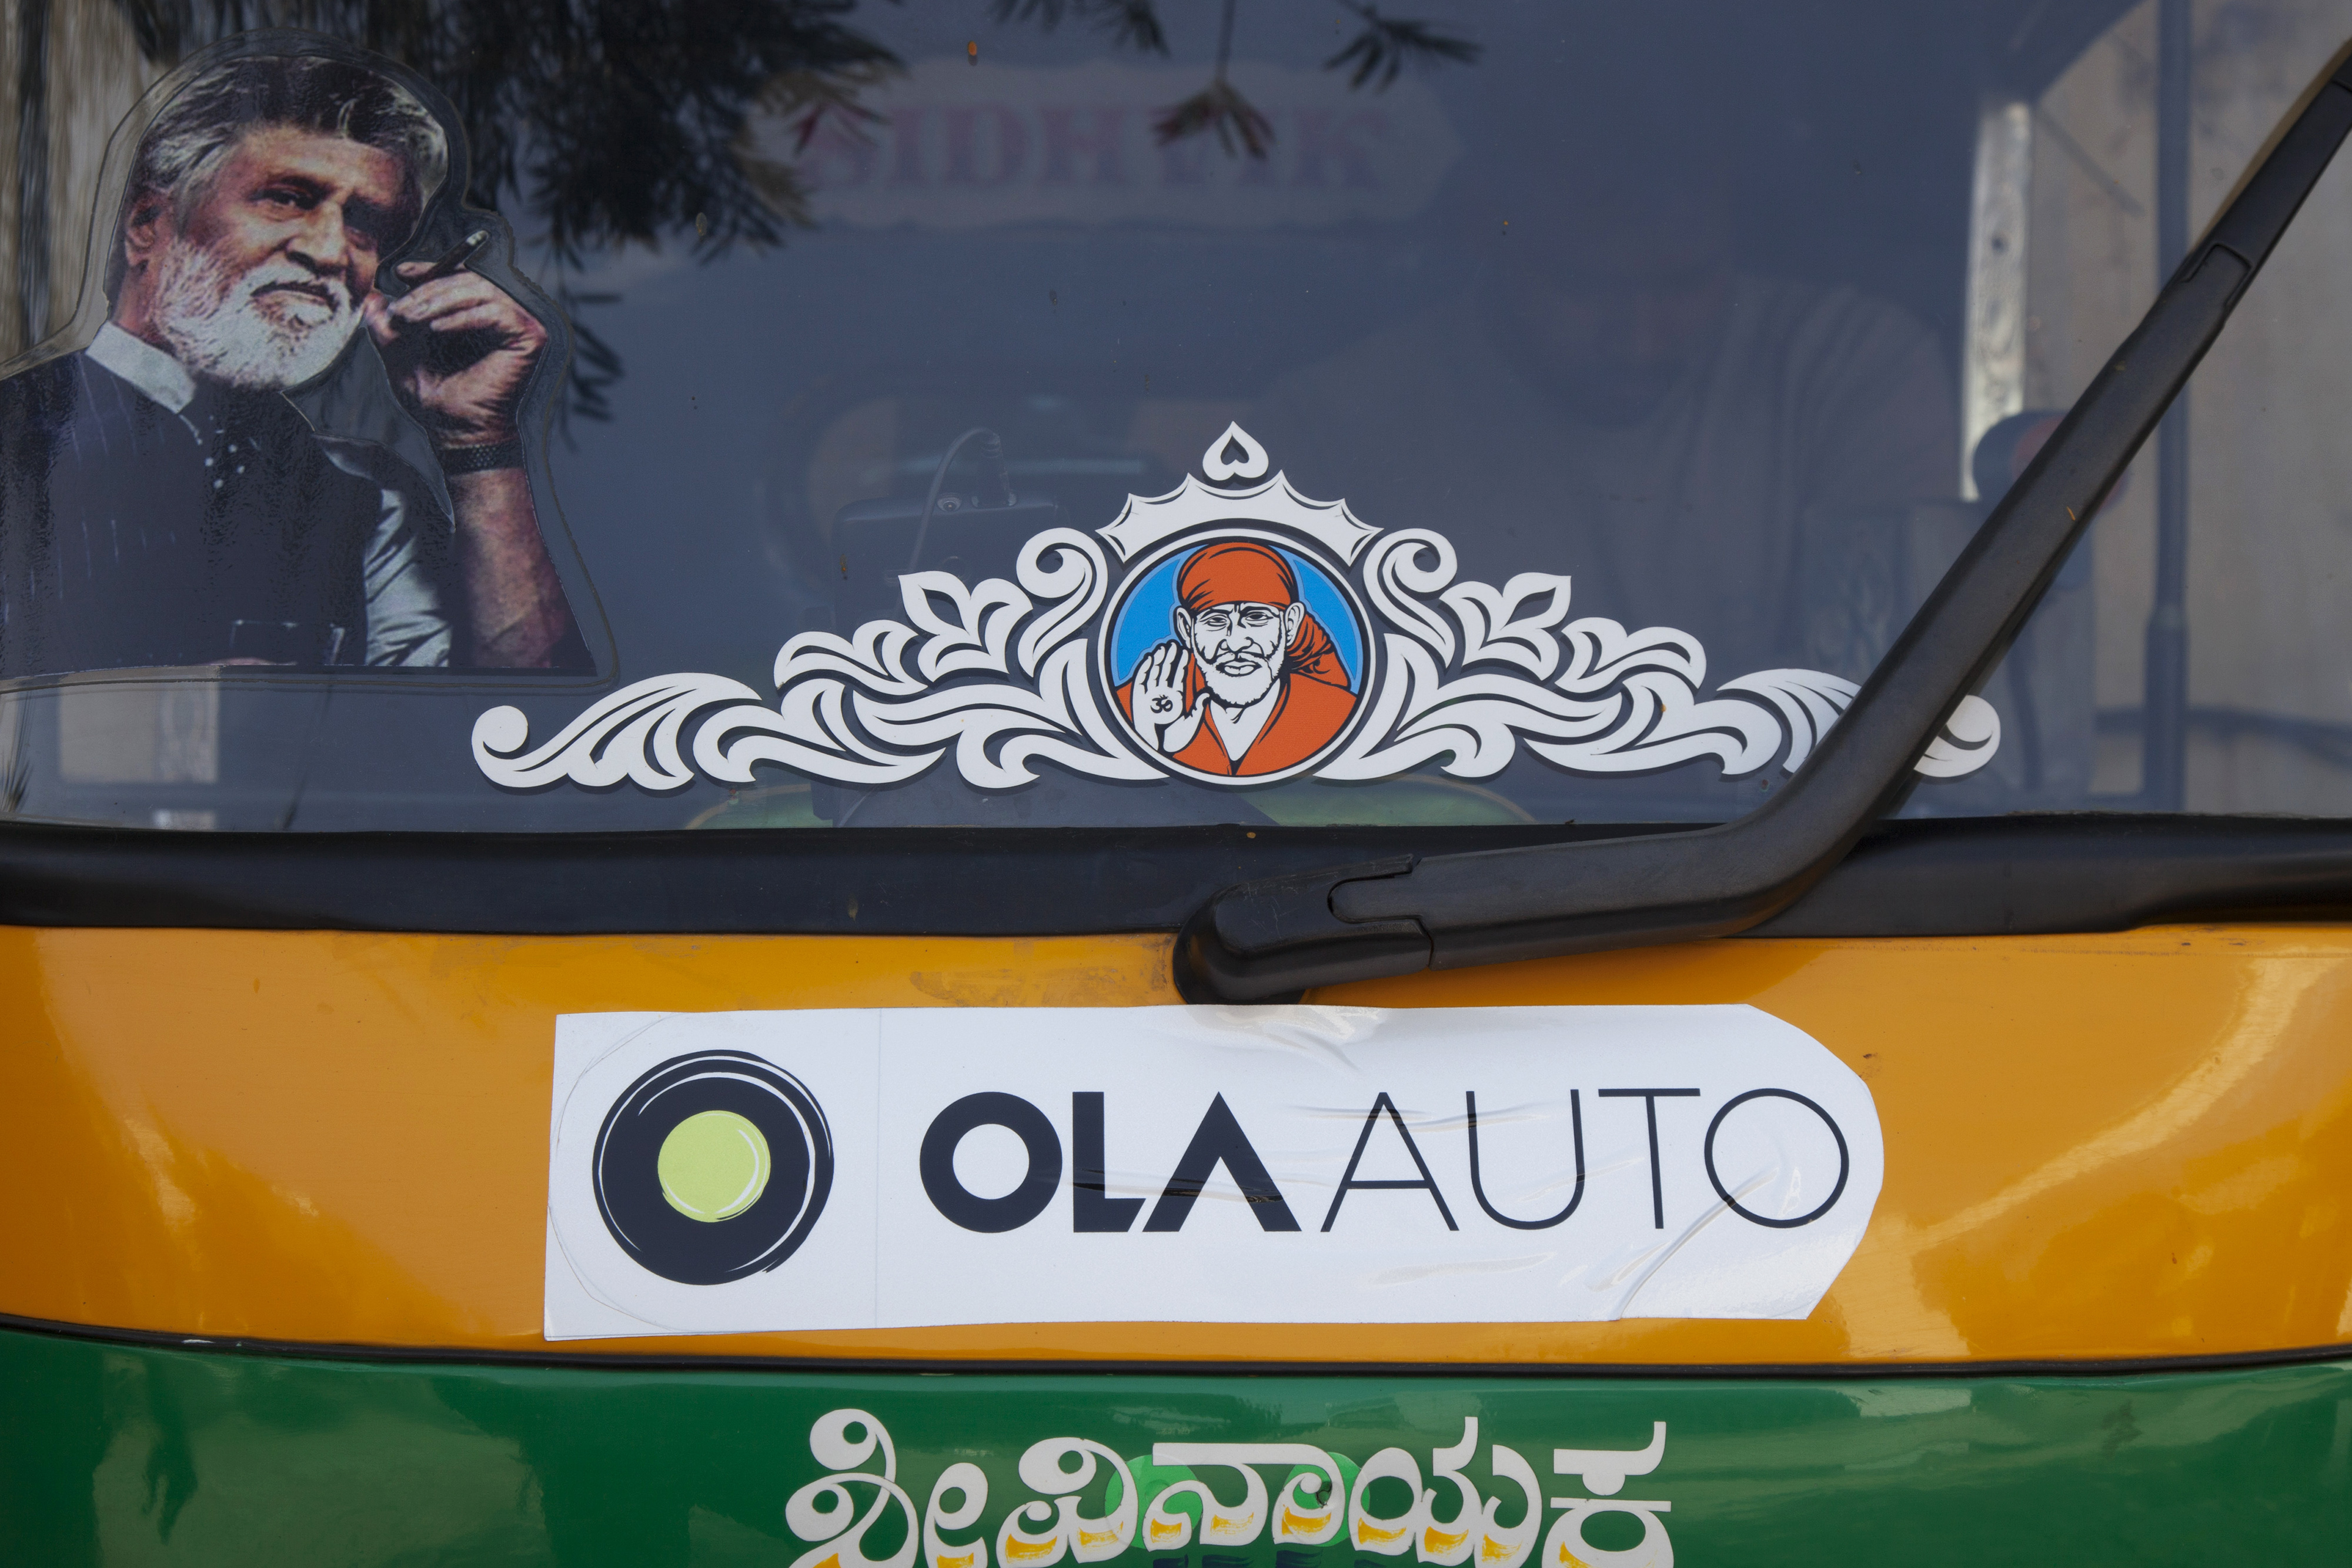 Ola CEO Bhavish Aggarwal Portraits